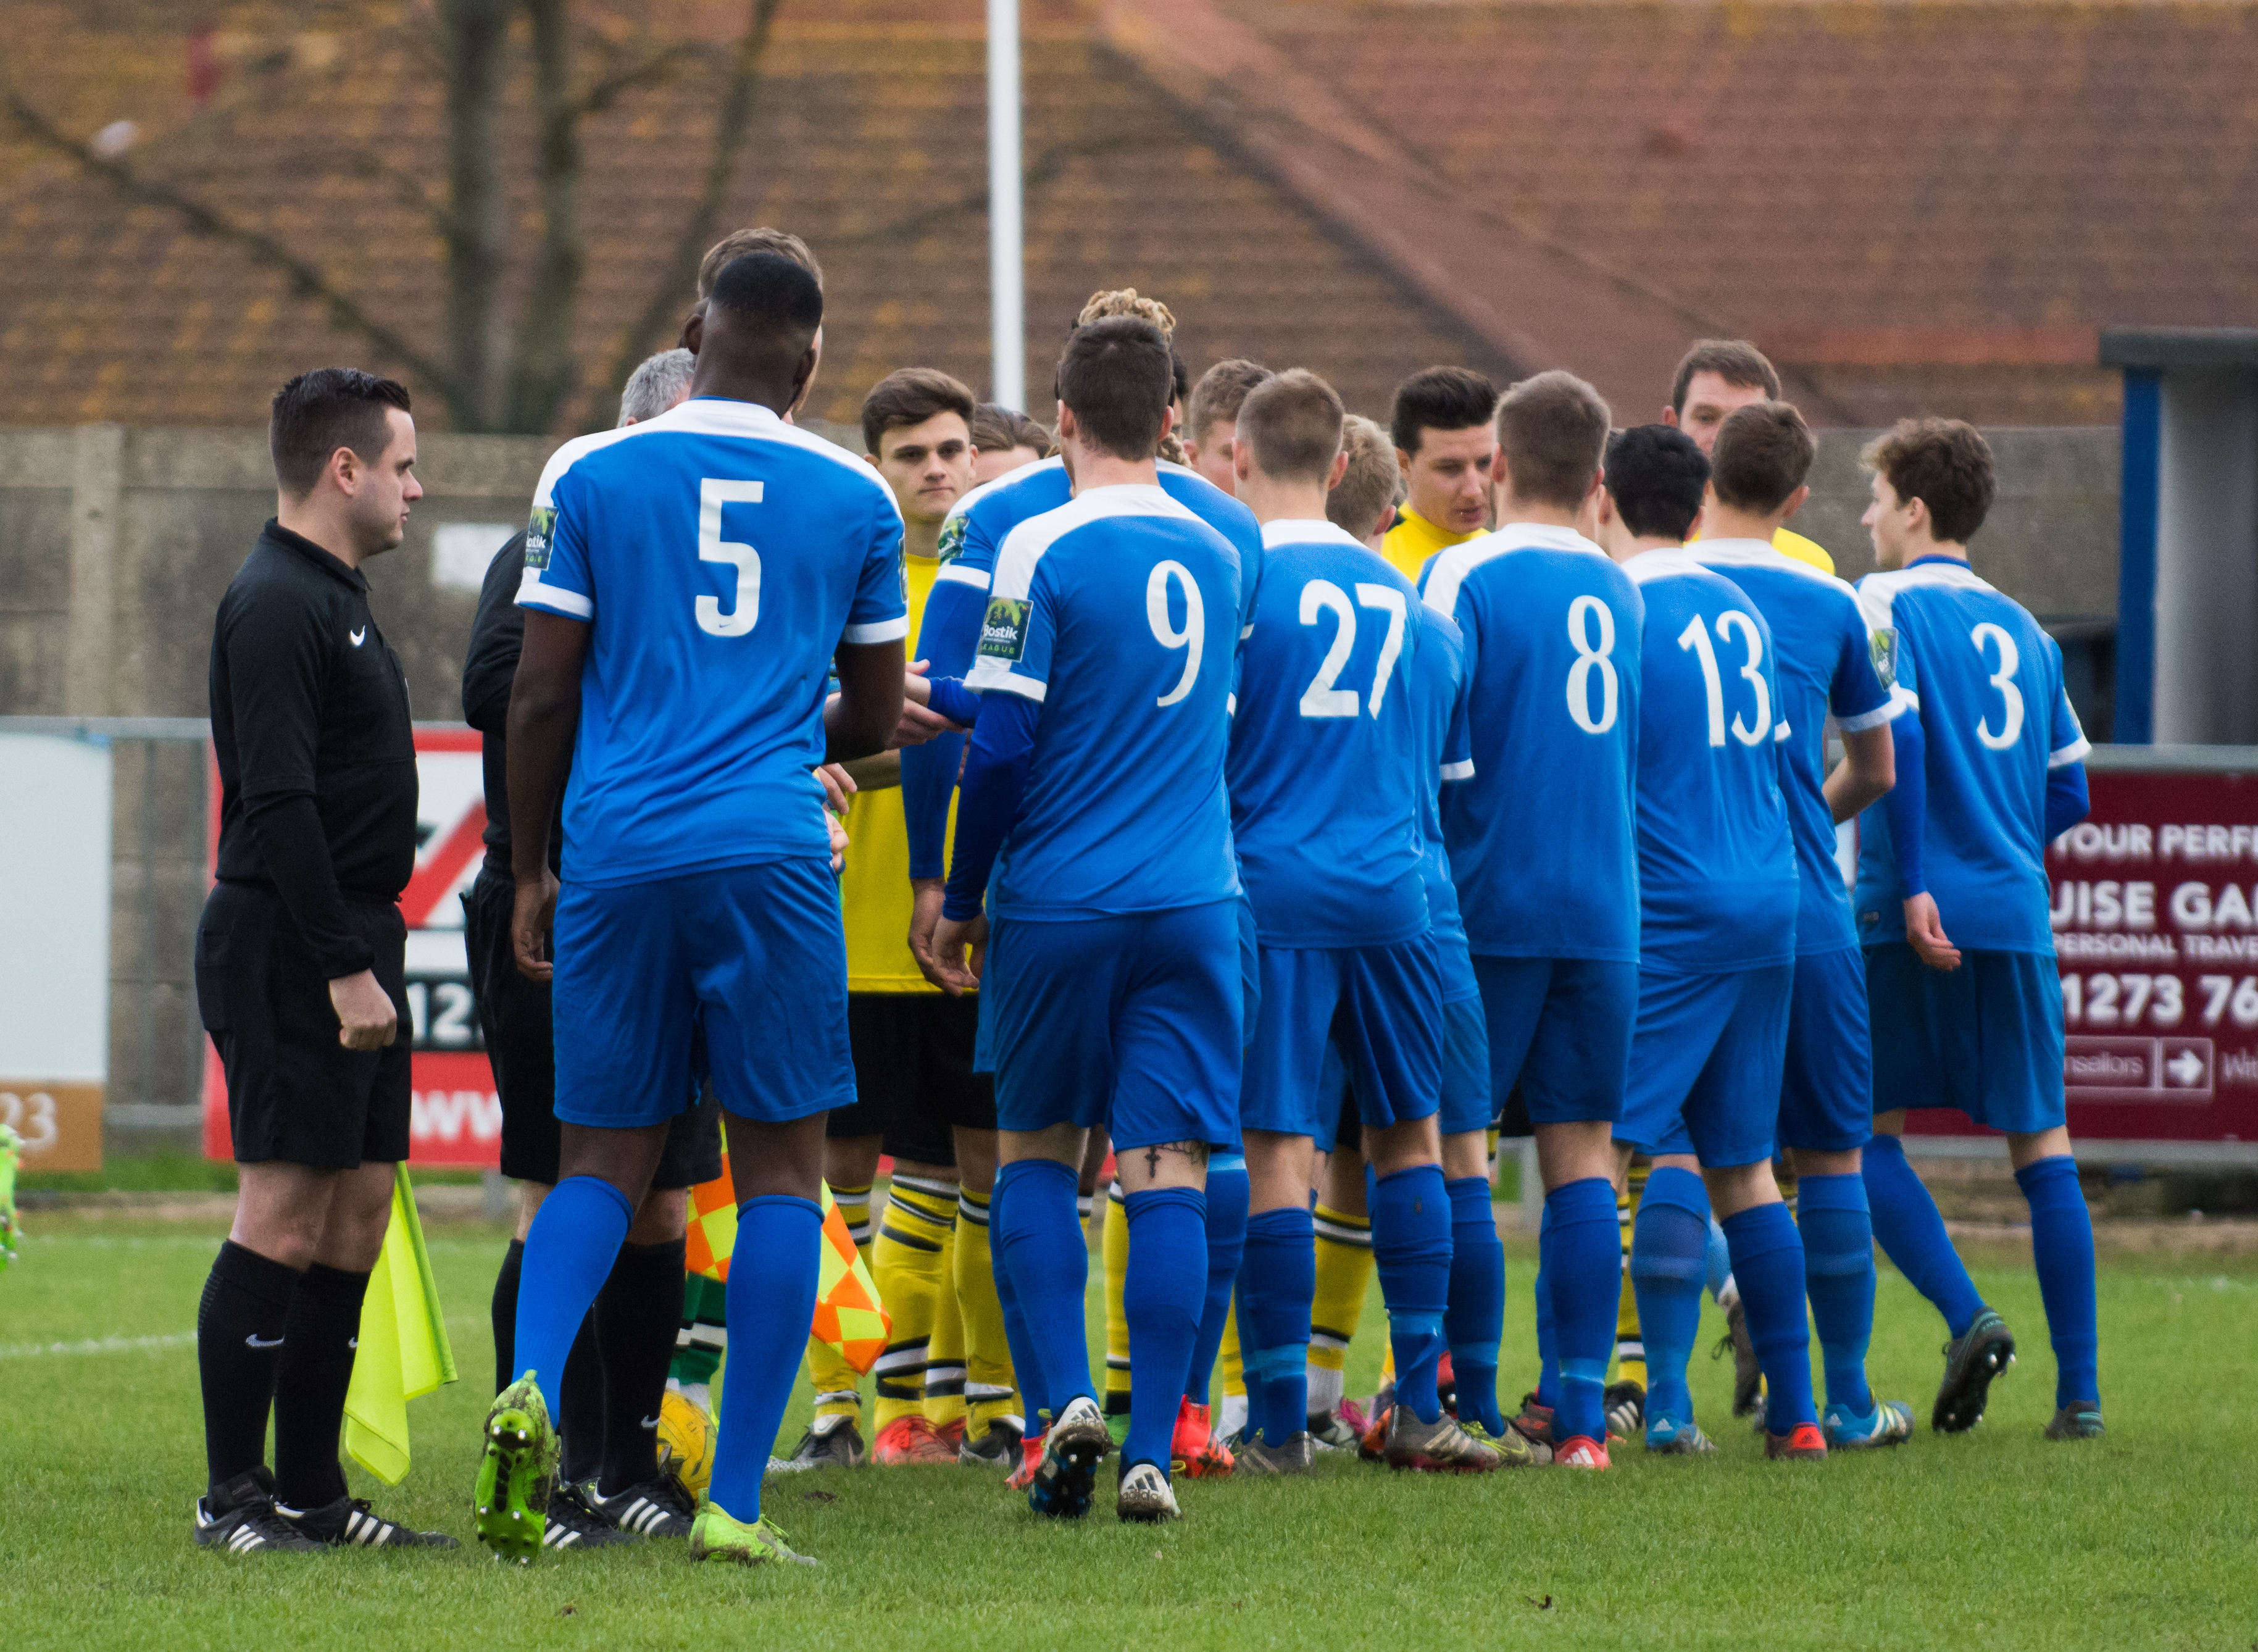 Shoreham FC vs Faversham Town 16.12.17 23